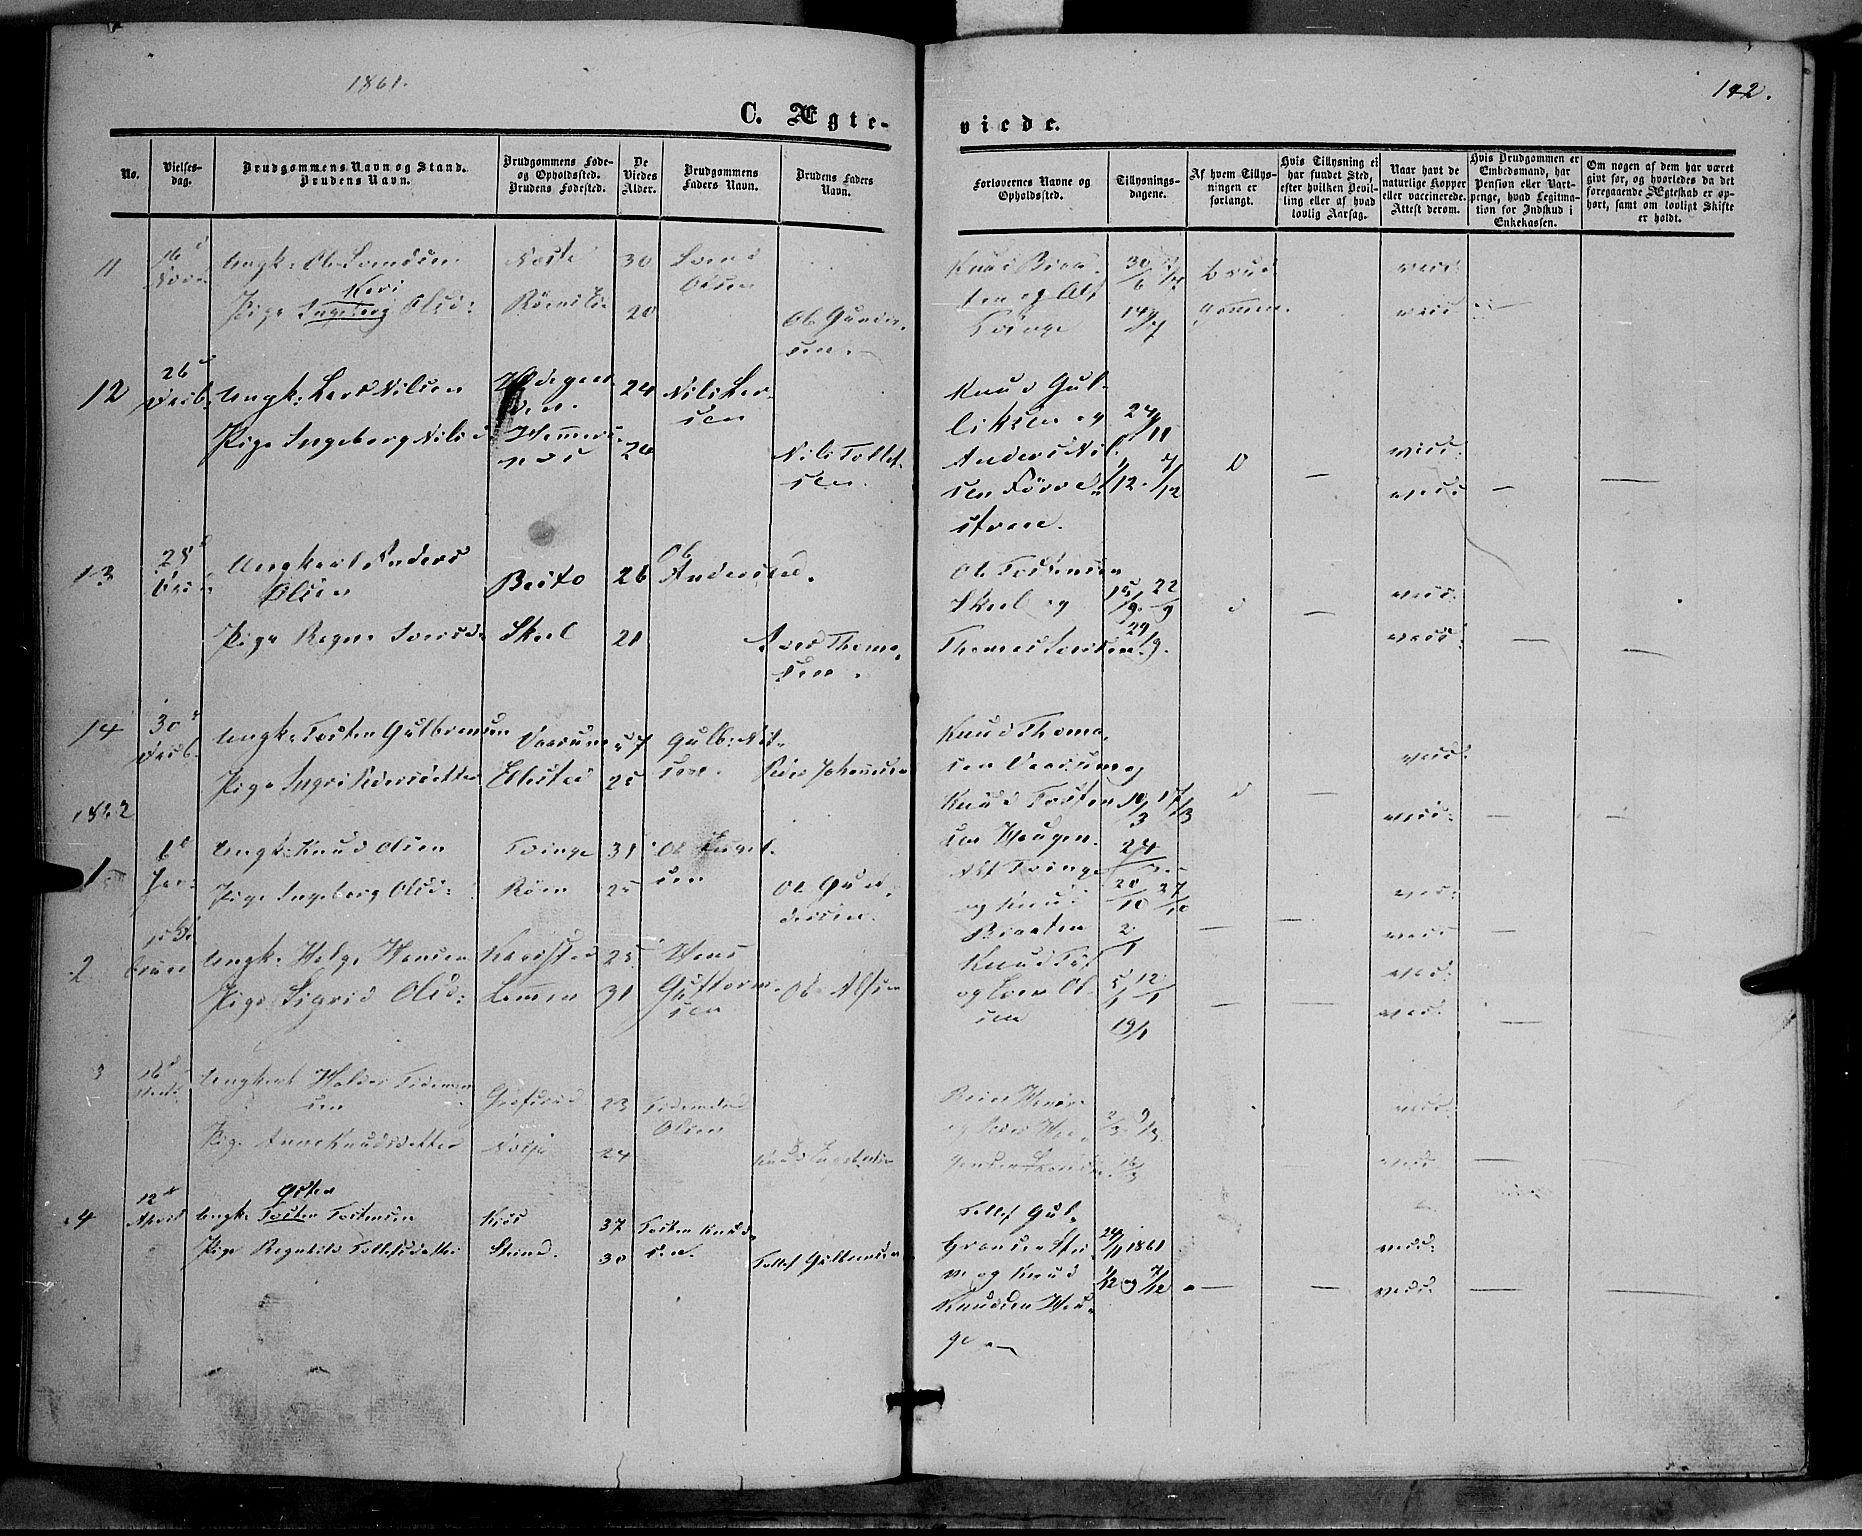 SAH, Vestre Slidre prestekontor, Ministerialbok nr. 2, 1856-1864, s. 142